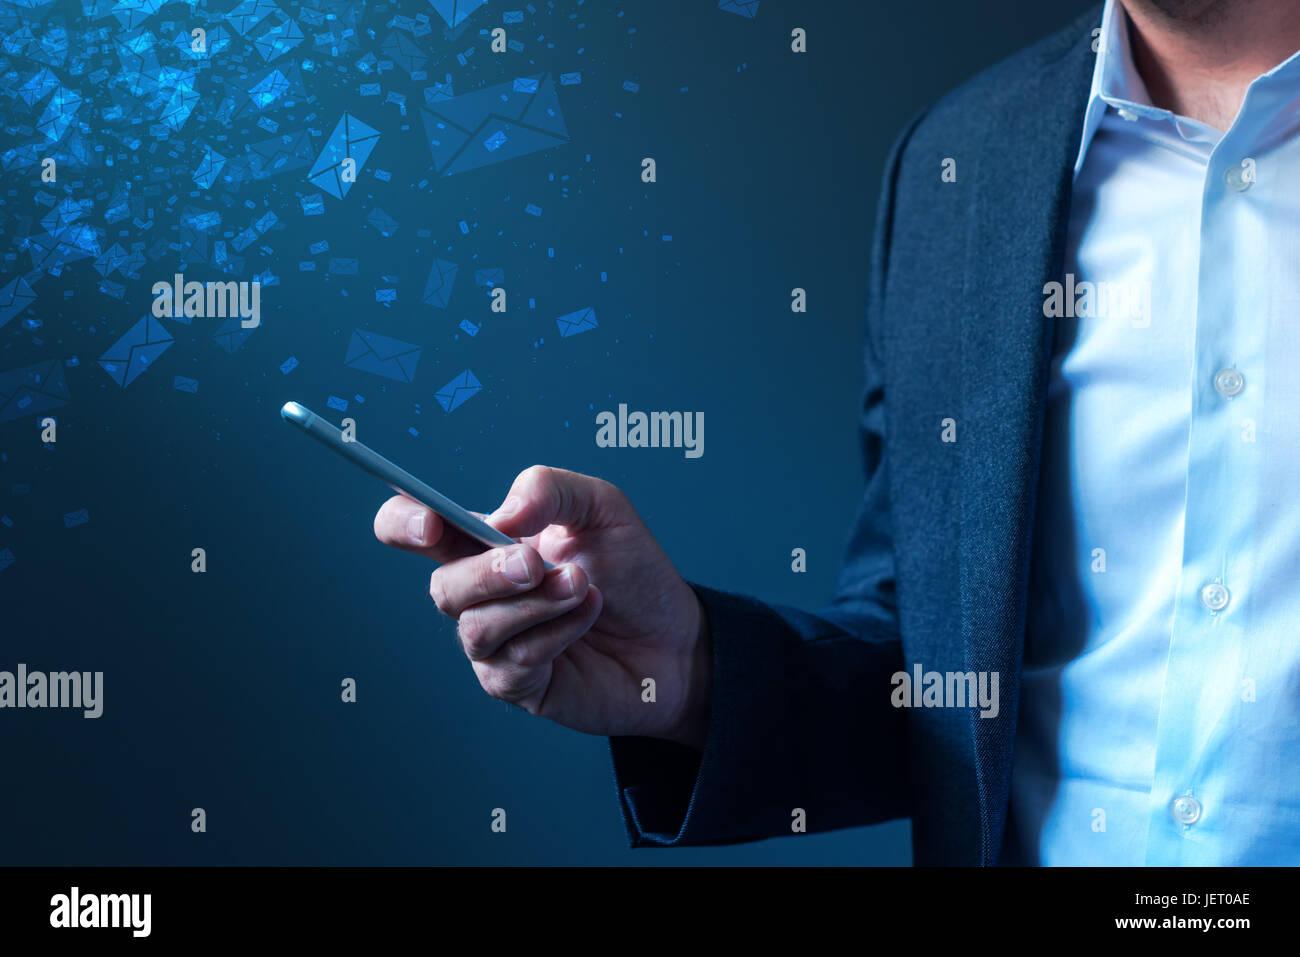 Businessman sending bulk messages using smartphone, male business person in elegant suit delivering e-mails, newsletters - Stock Image